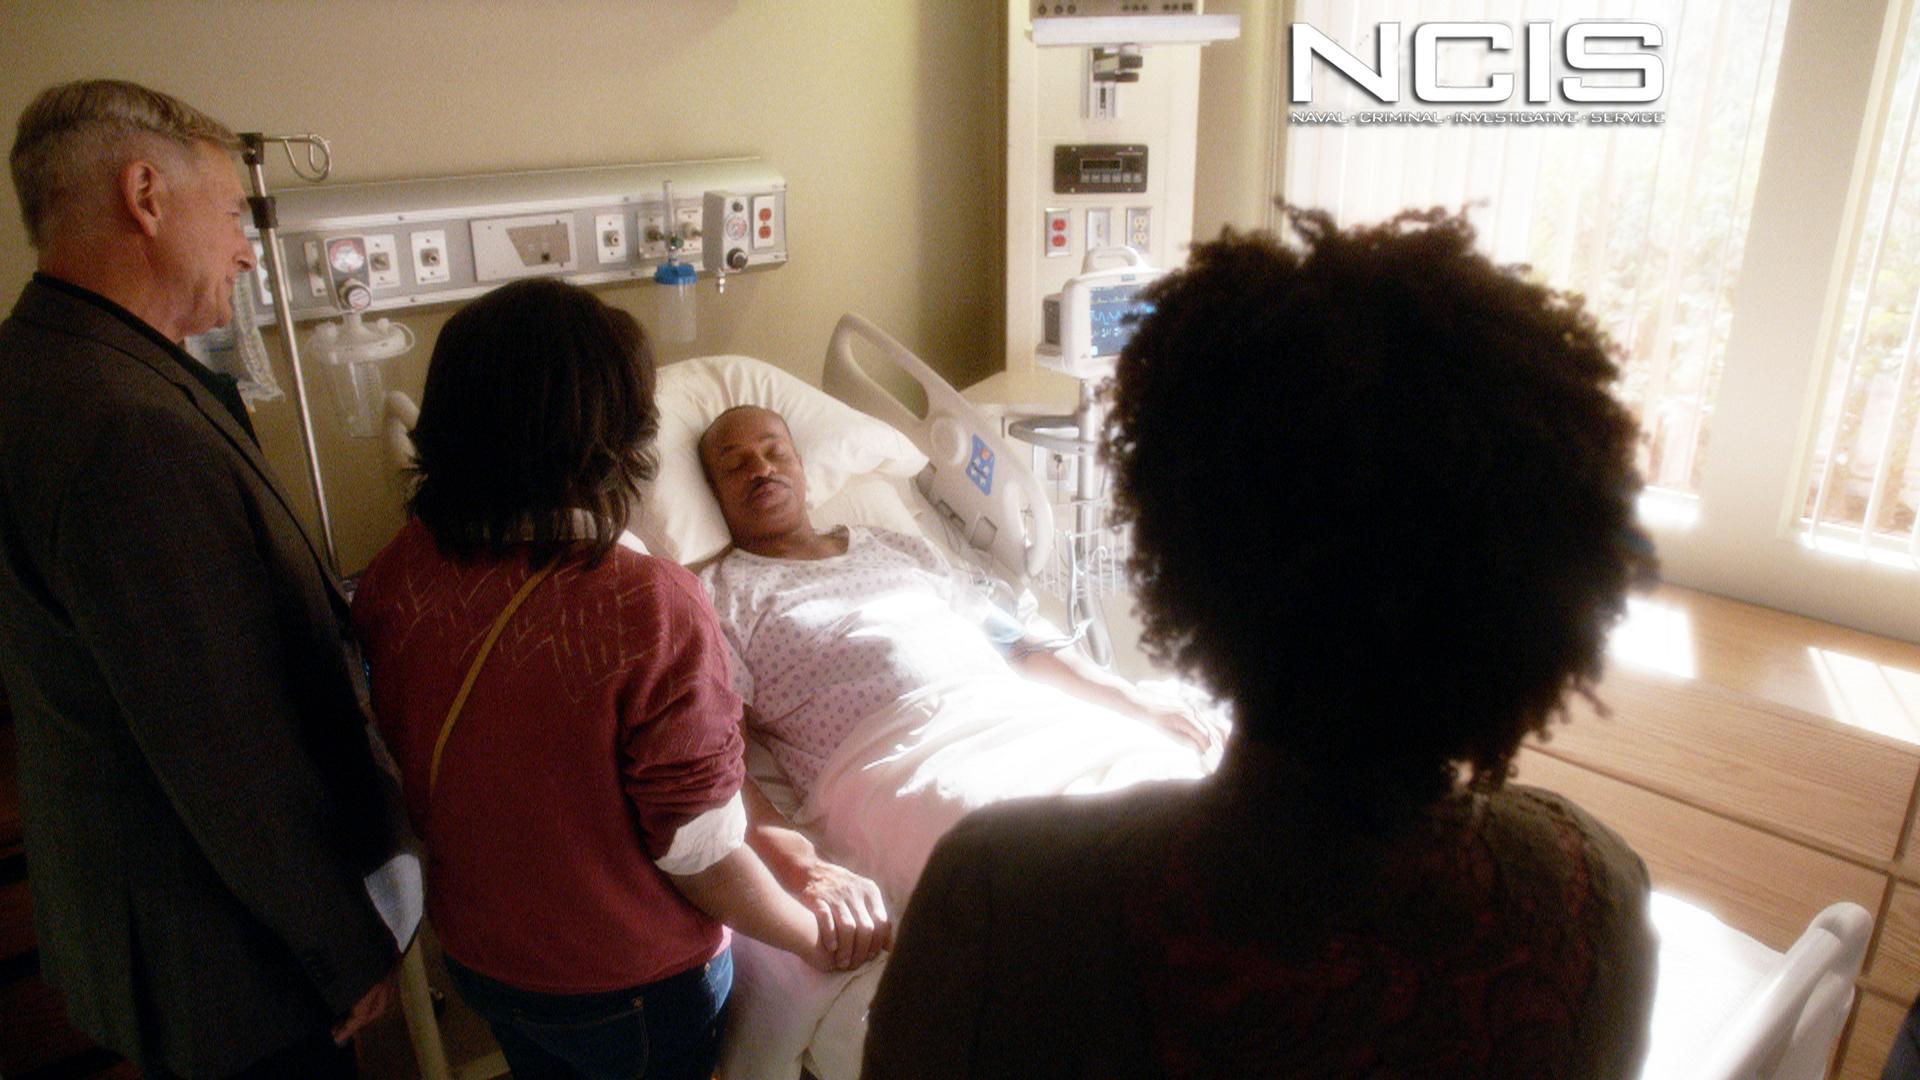 Director Vance had a major health scare.